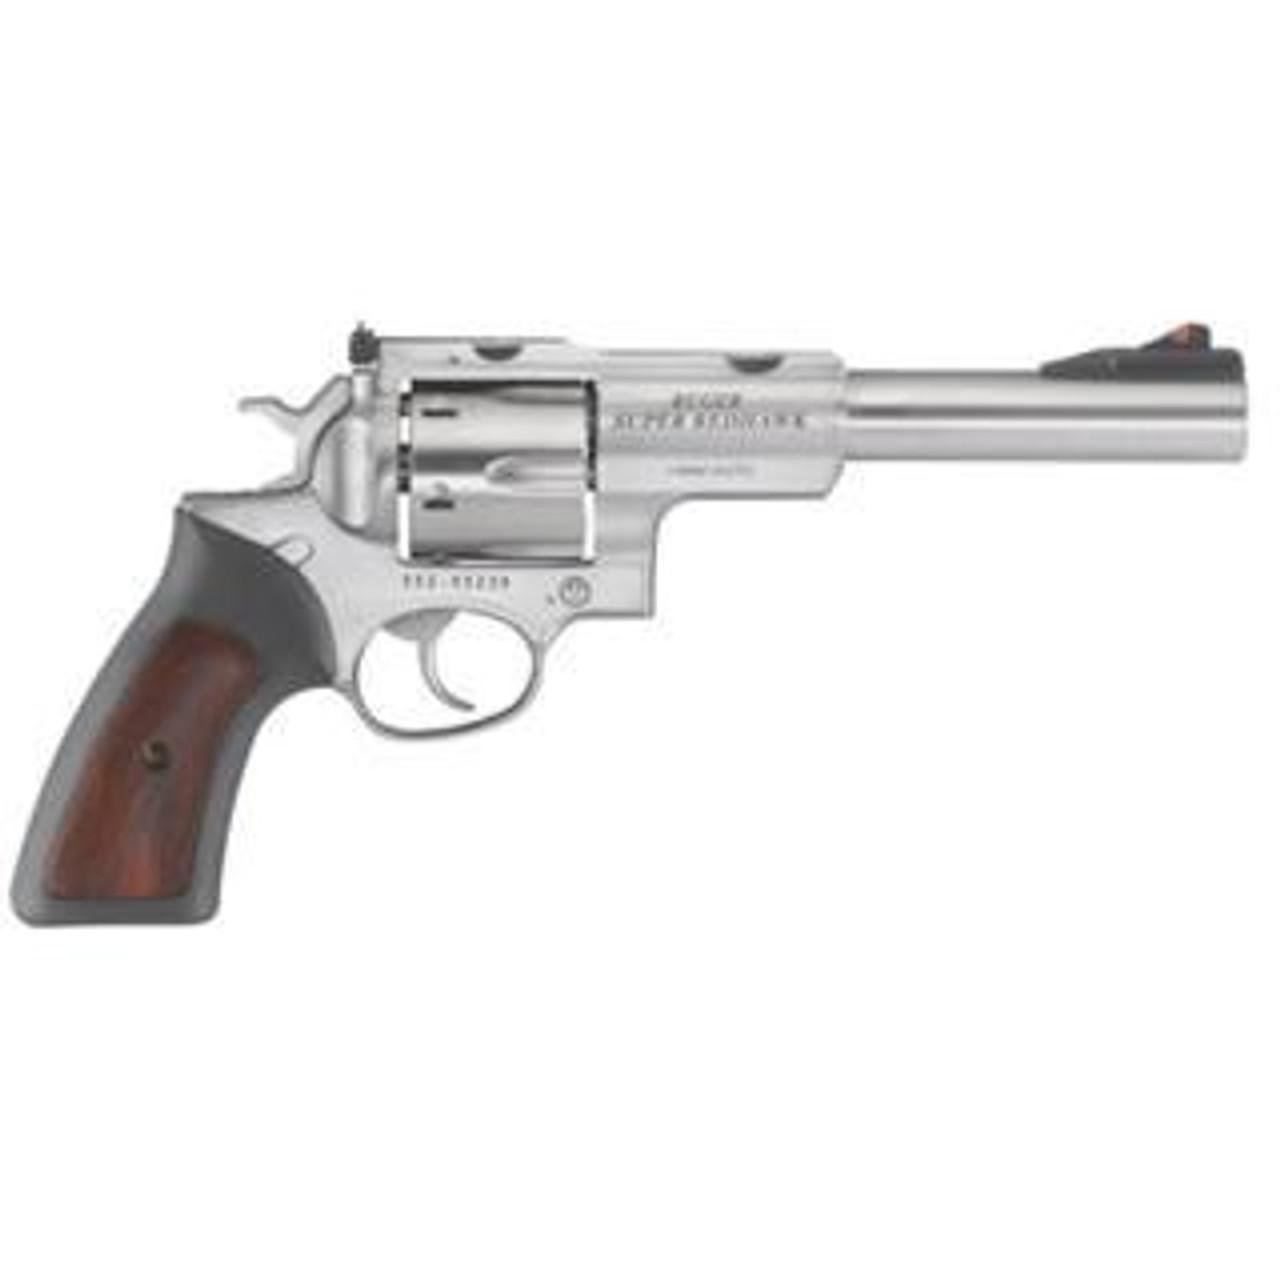 Ruger Super Redhawk CALIFORNIA LEGAL - 10mm